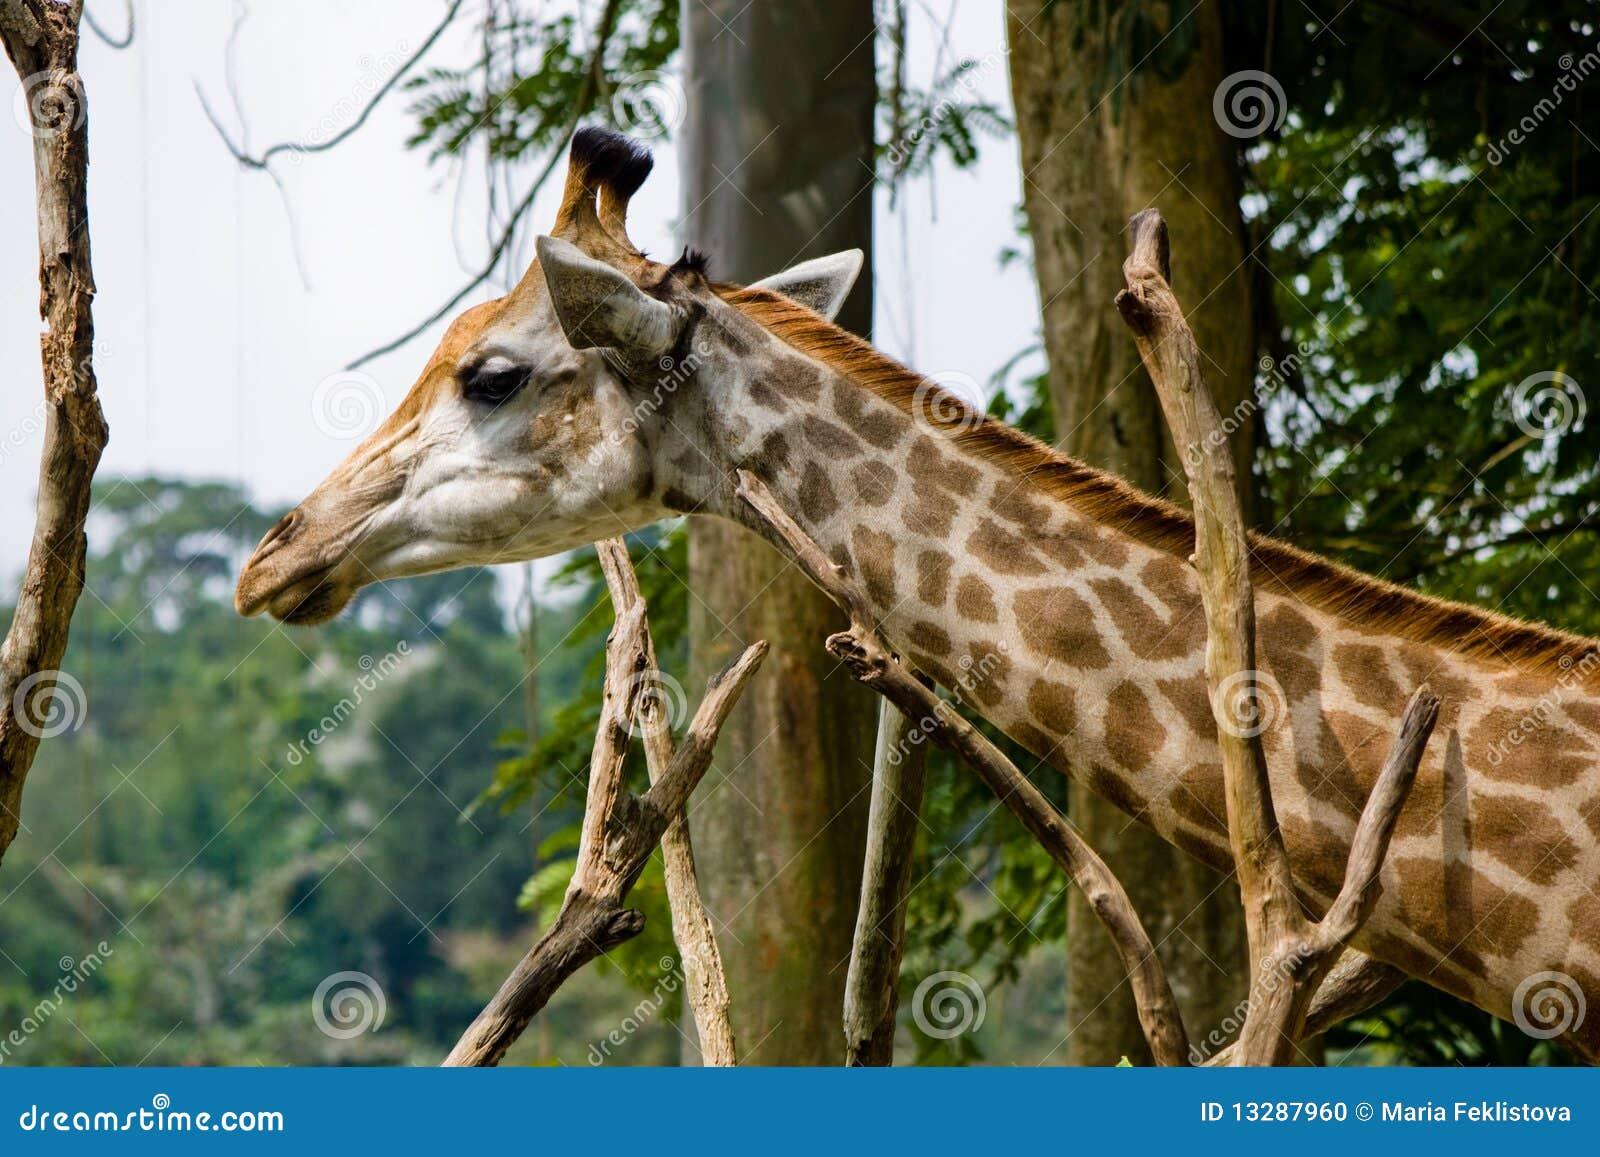 Head shot of Giraffe